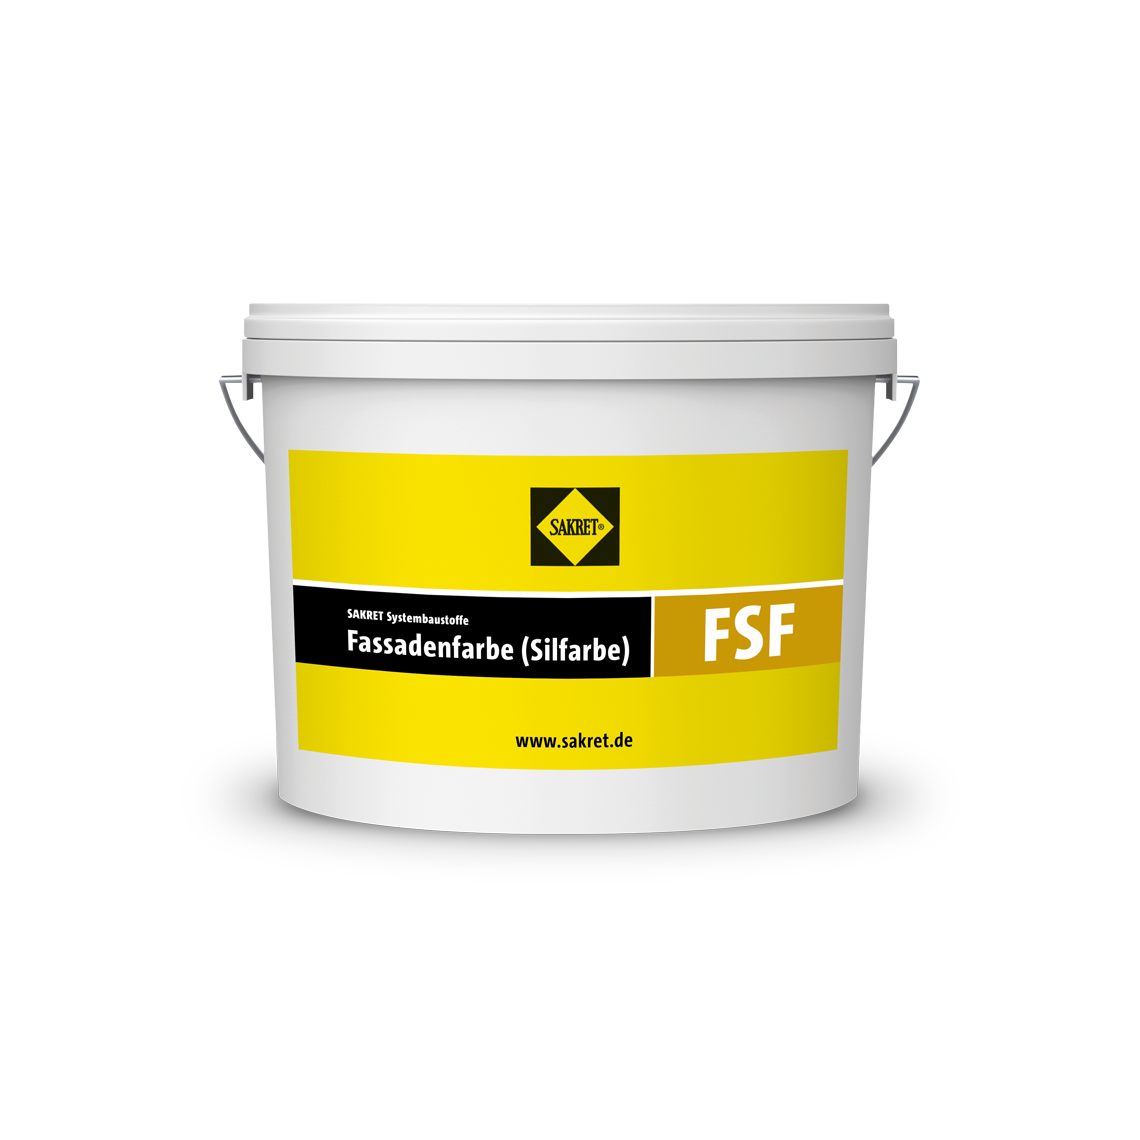 Abbildung SAKRET Fassadenfarbe Silfarbe FSF